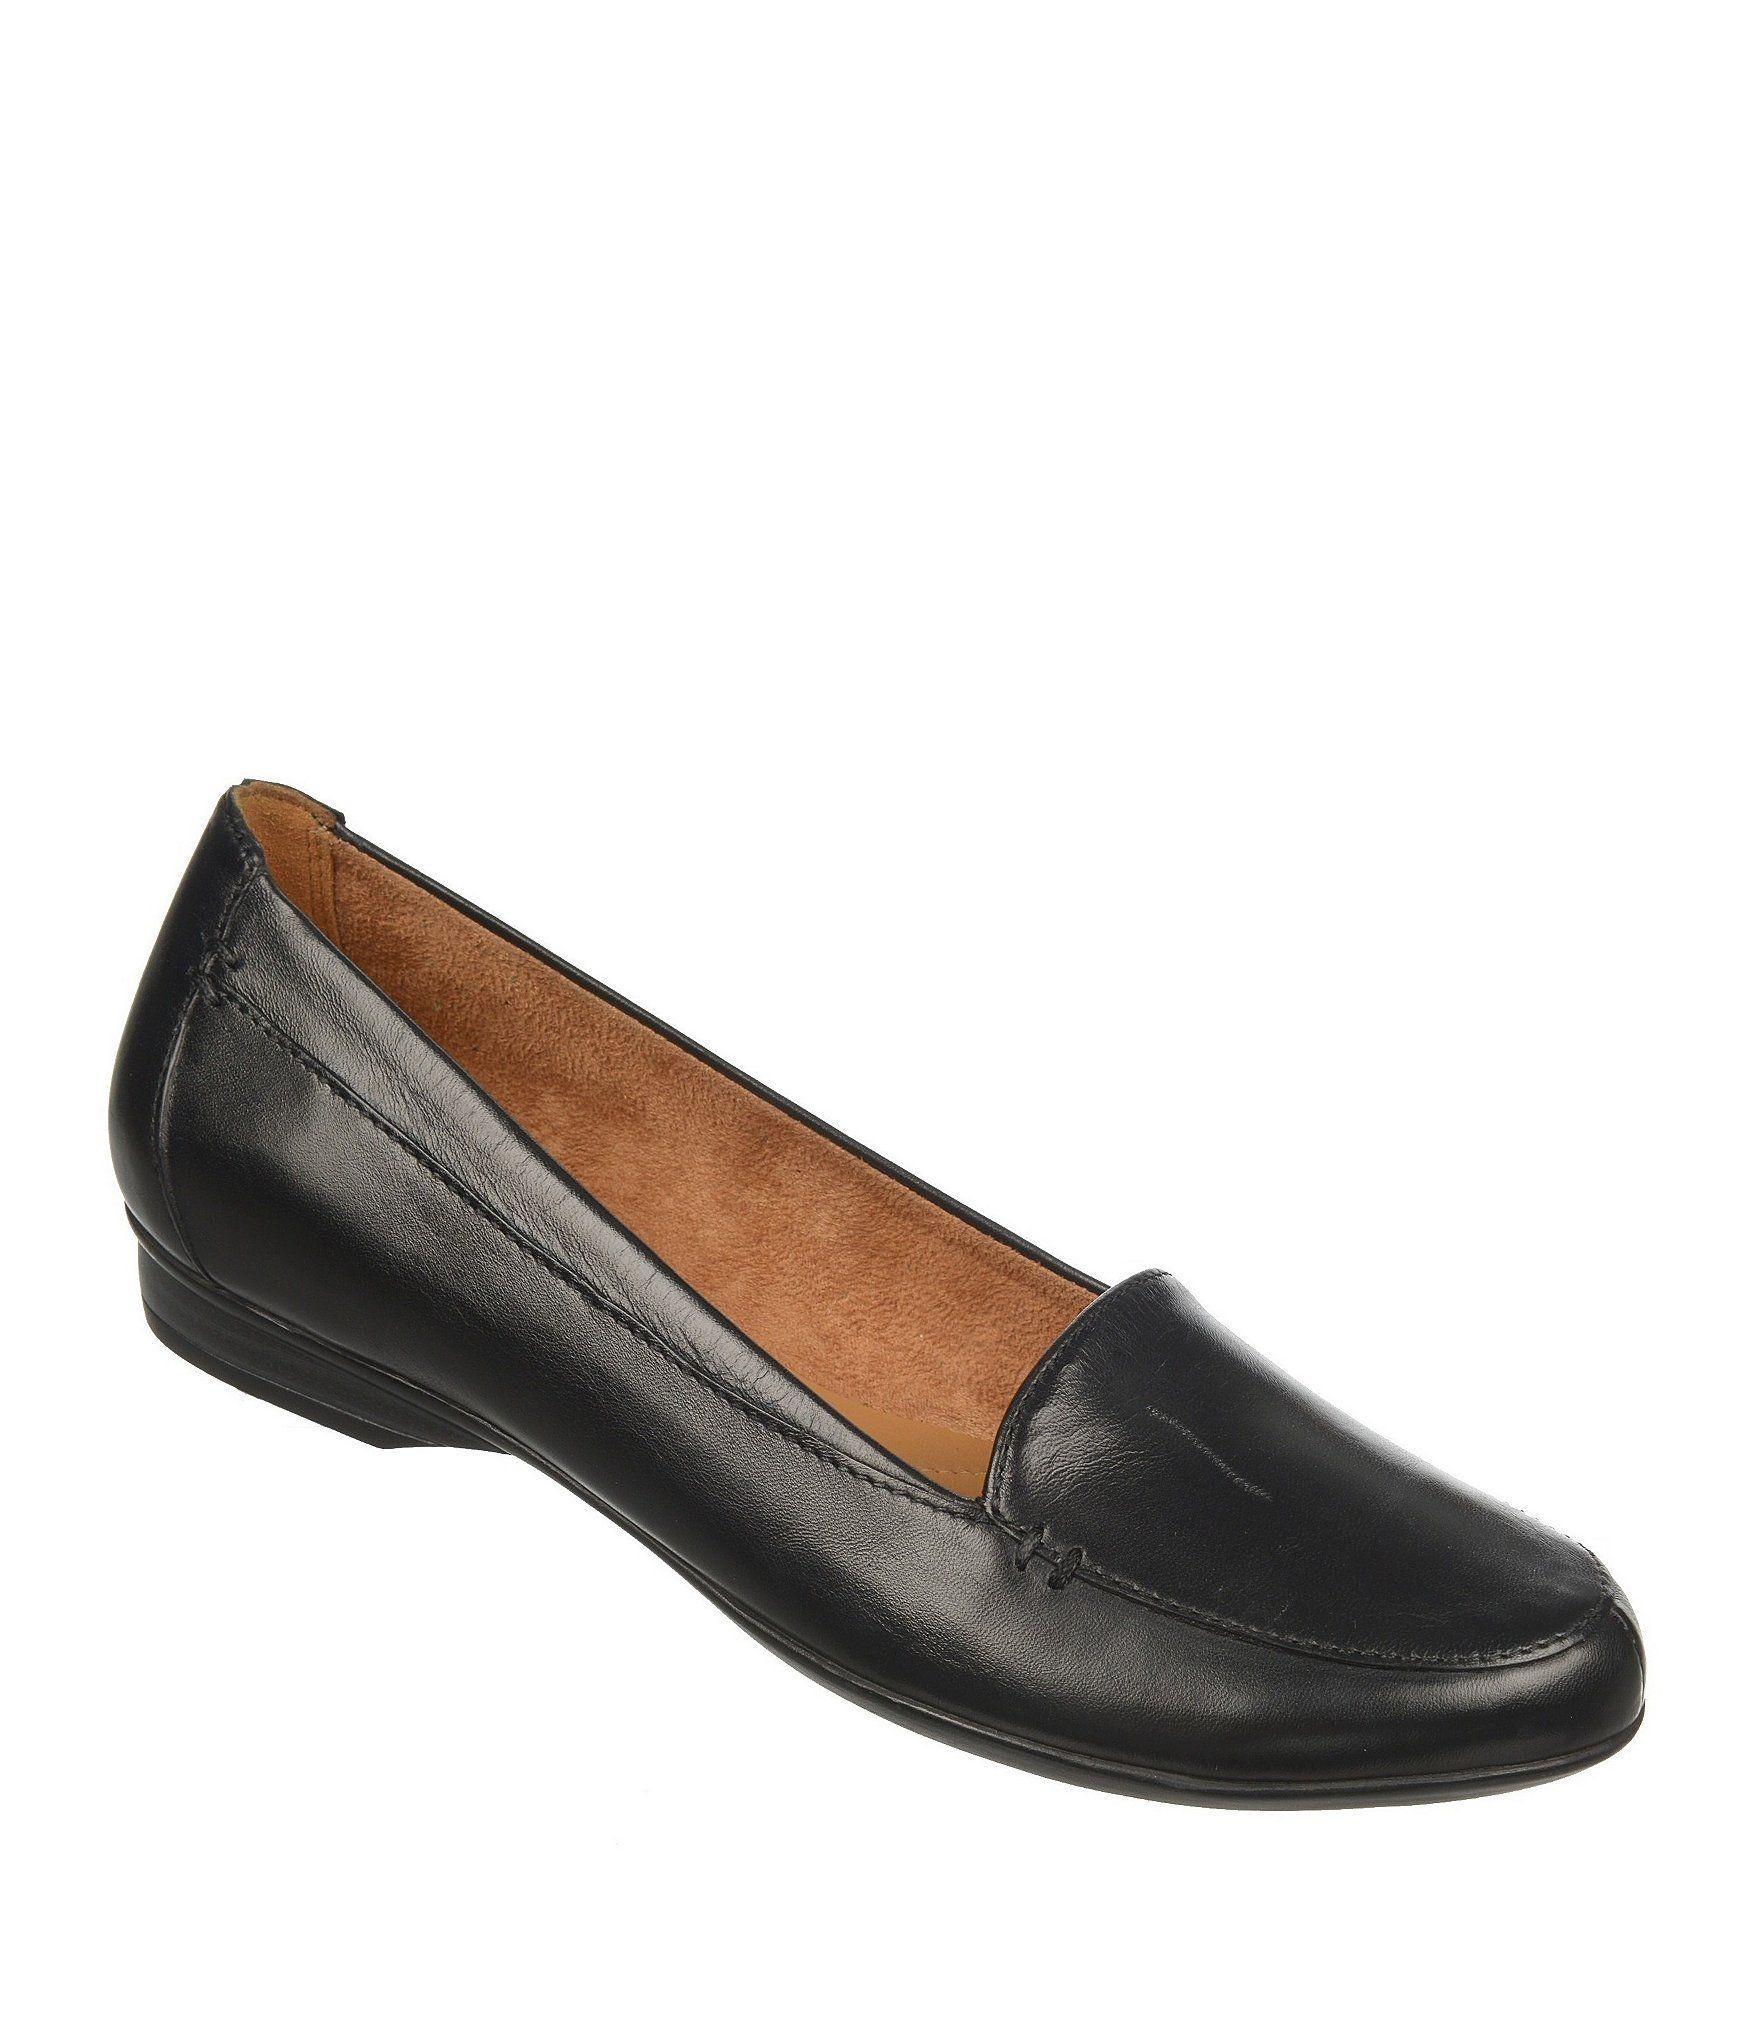 Naturalizer Saban Leather Slip-Ons